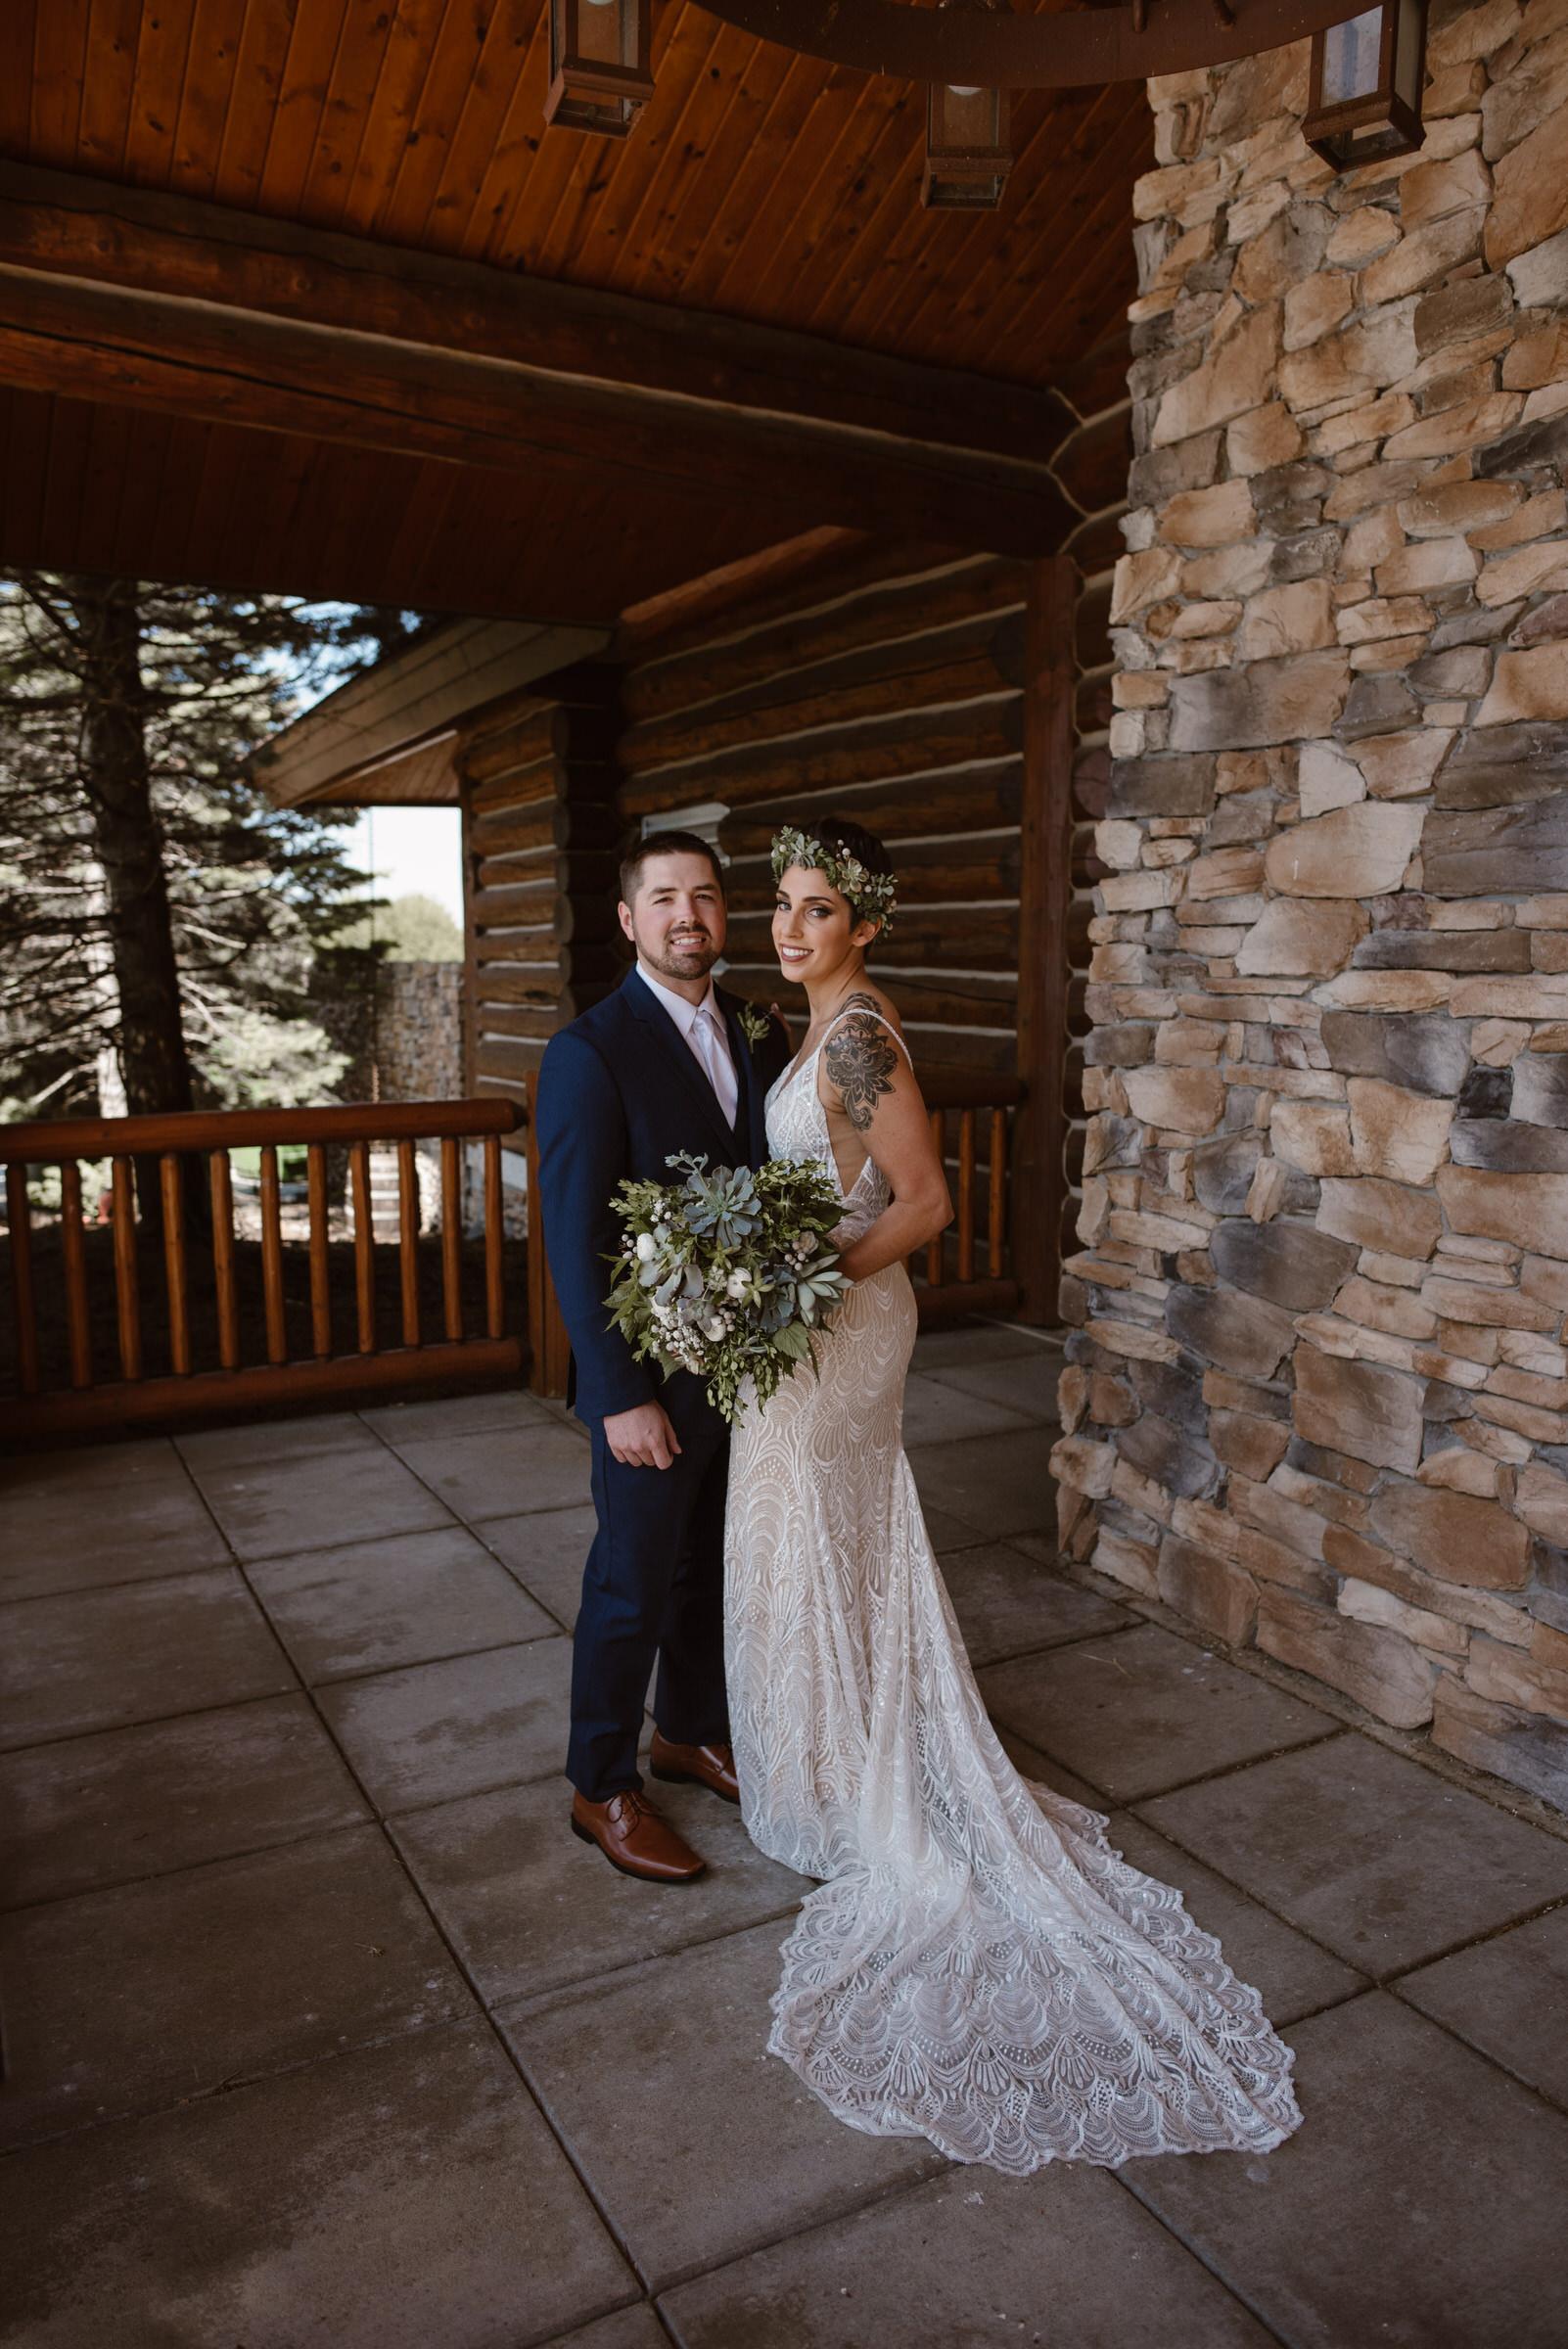 Wilderness-Ridge-Lincoln-Nebraska-Wedding-Kaylie-Sirek-Photography-035.jpg